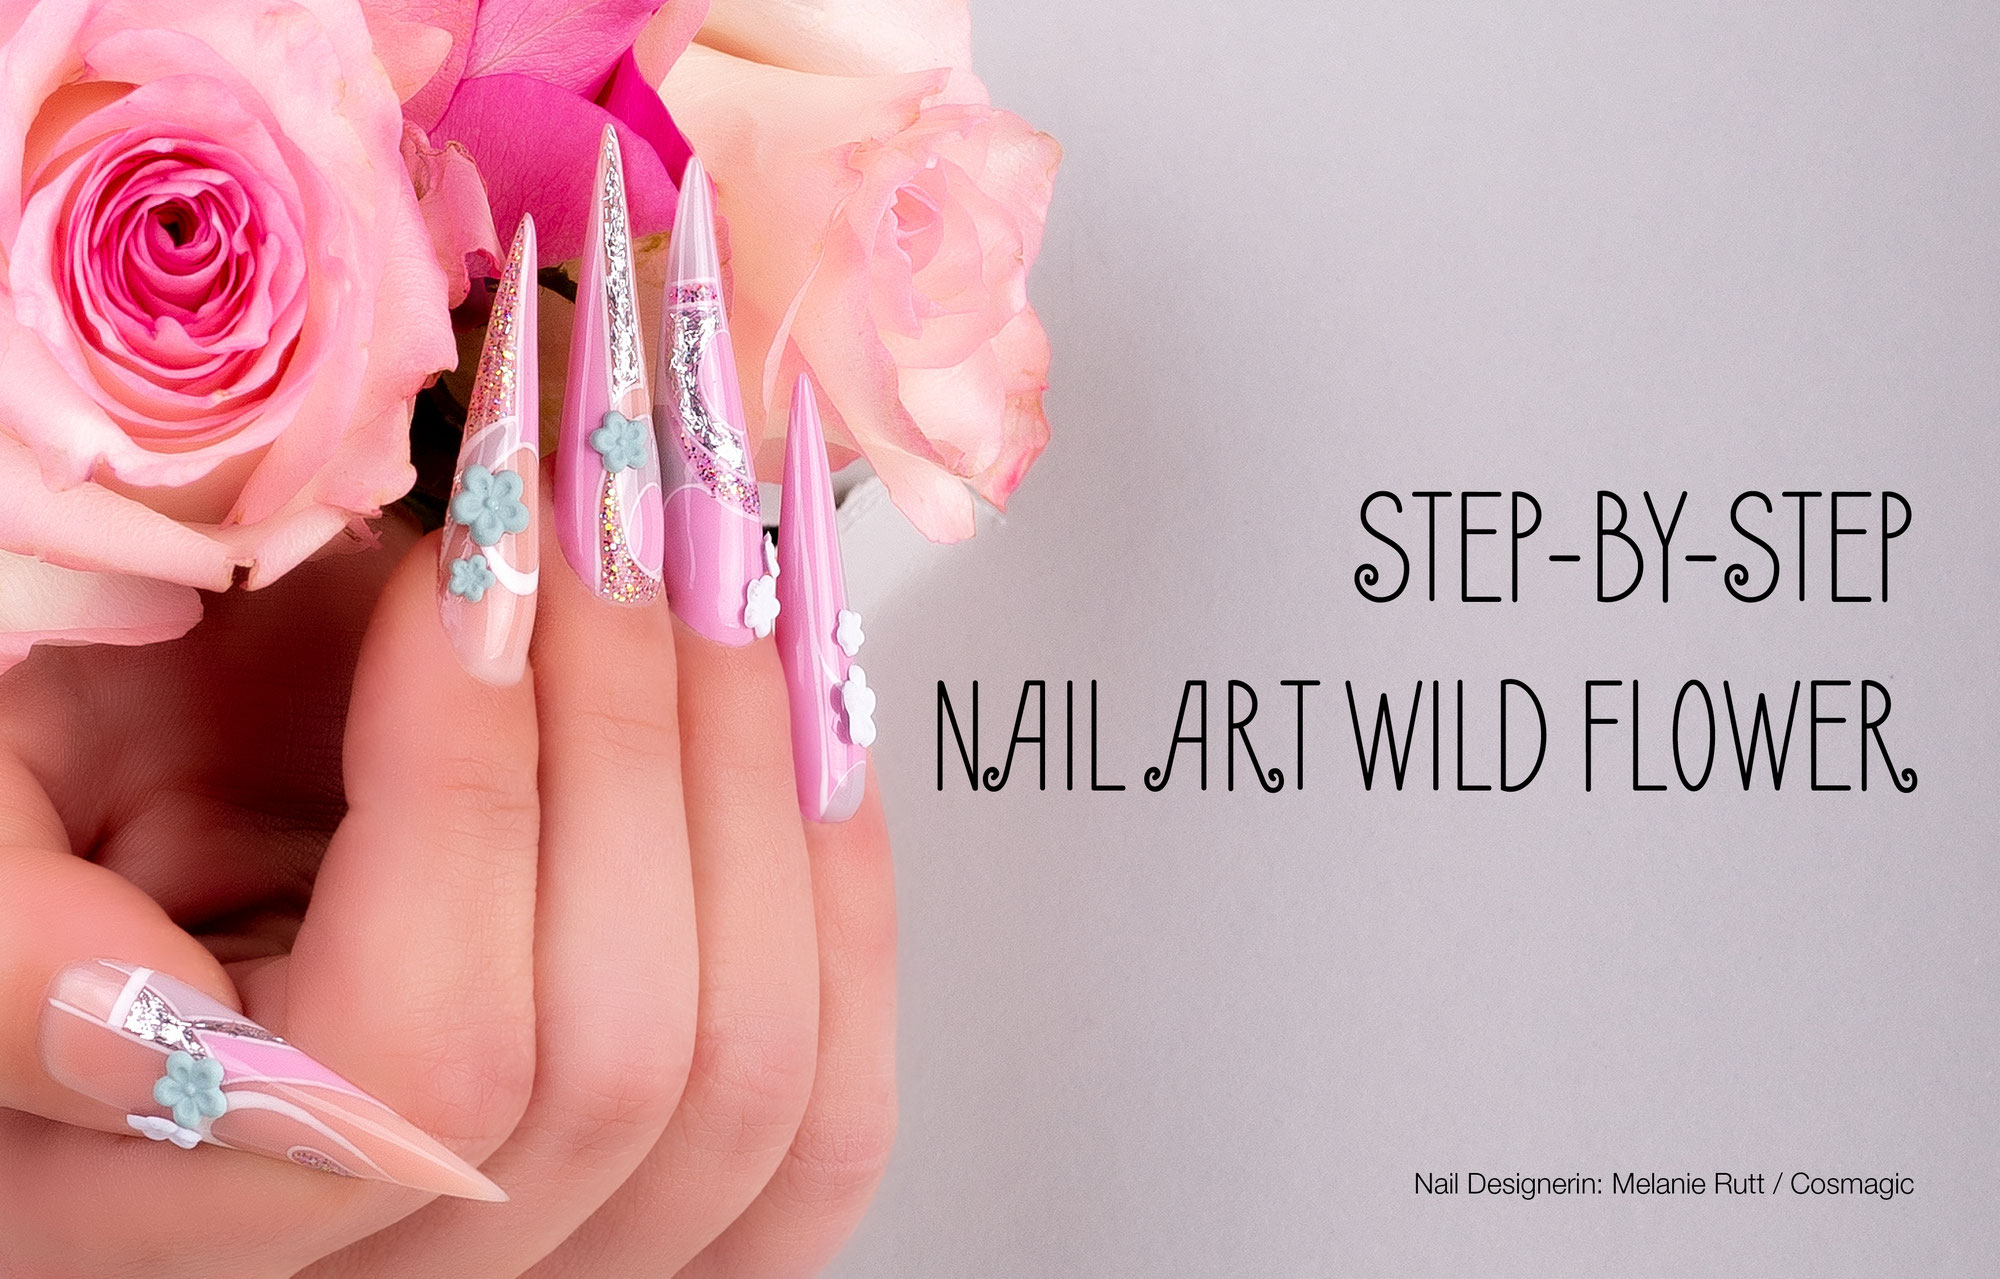 Nail Art Wild Flower